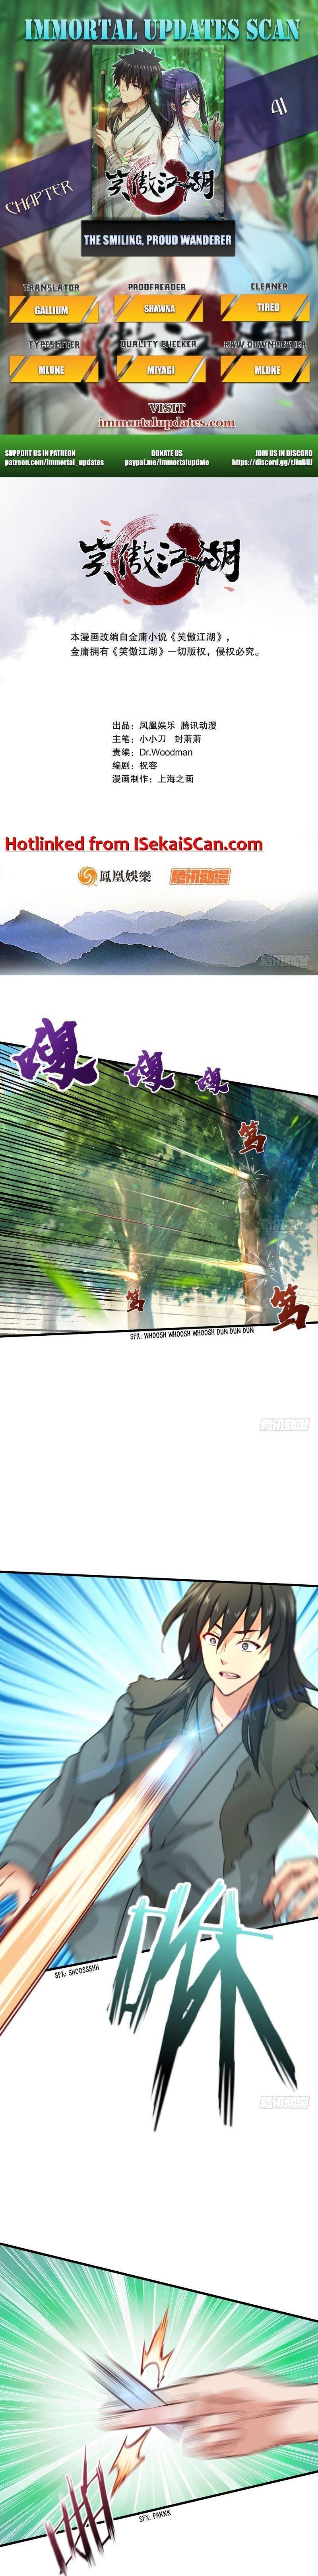 Manga The Smiling, Proud Wanderer (Swordsman) - Chapter 41 Page 1